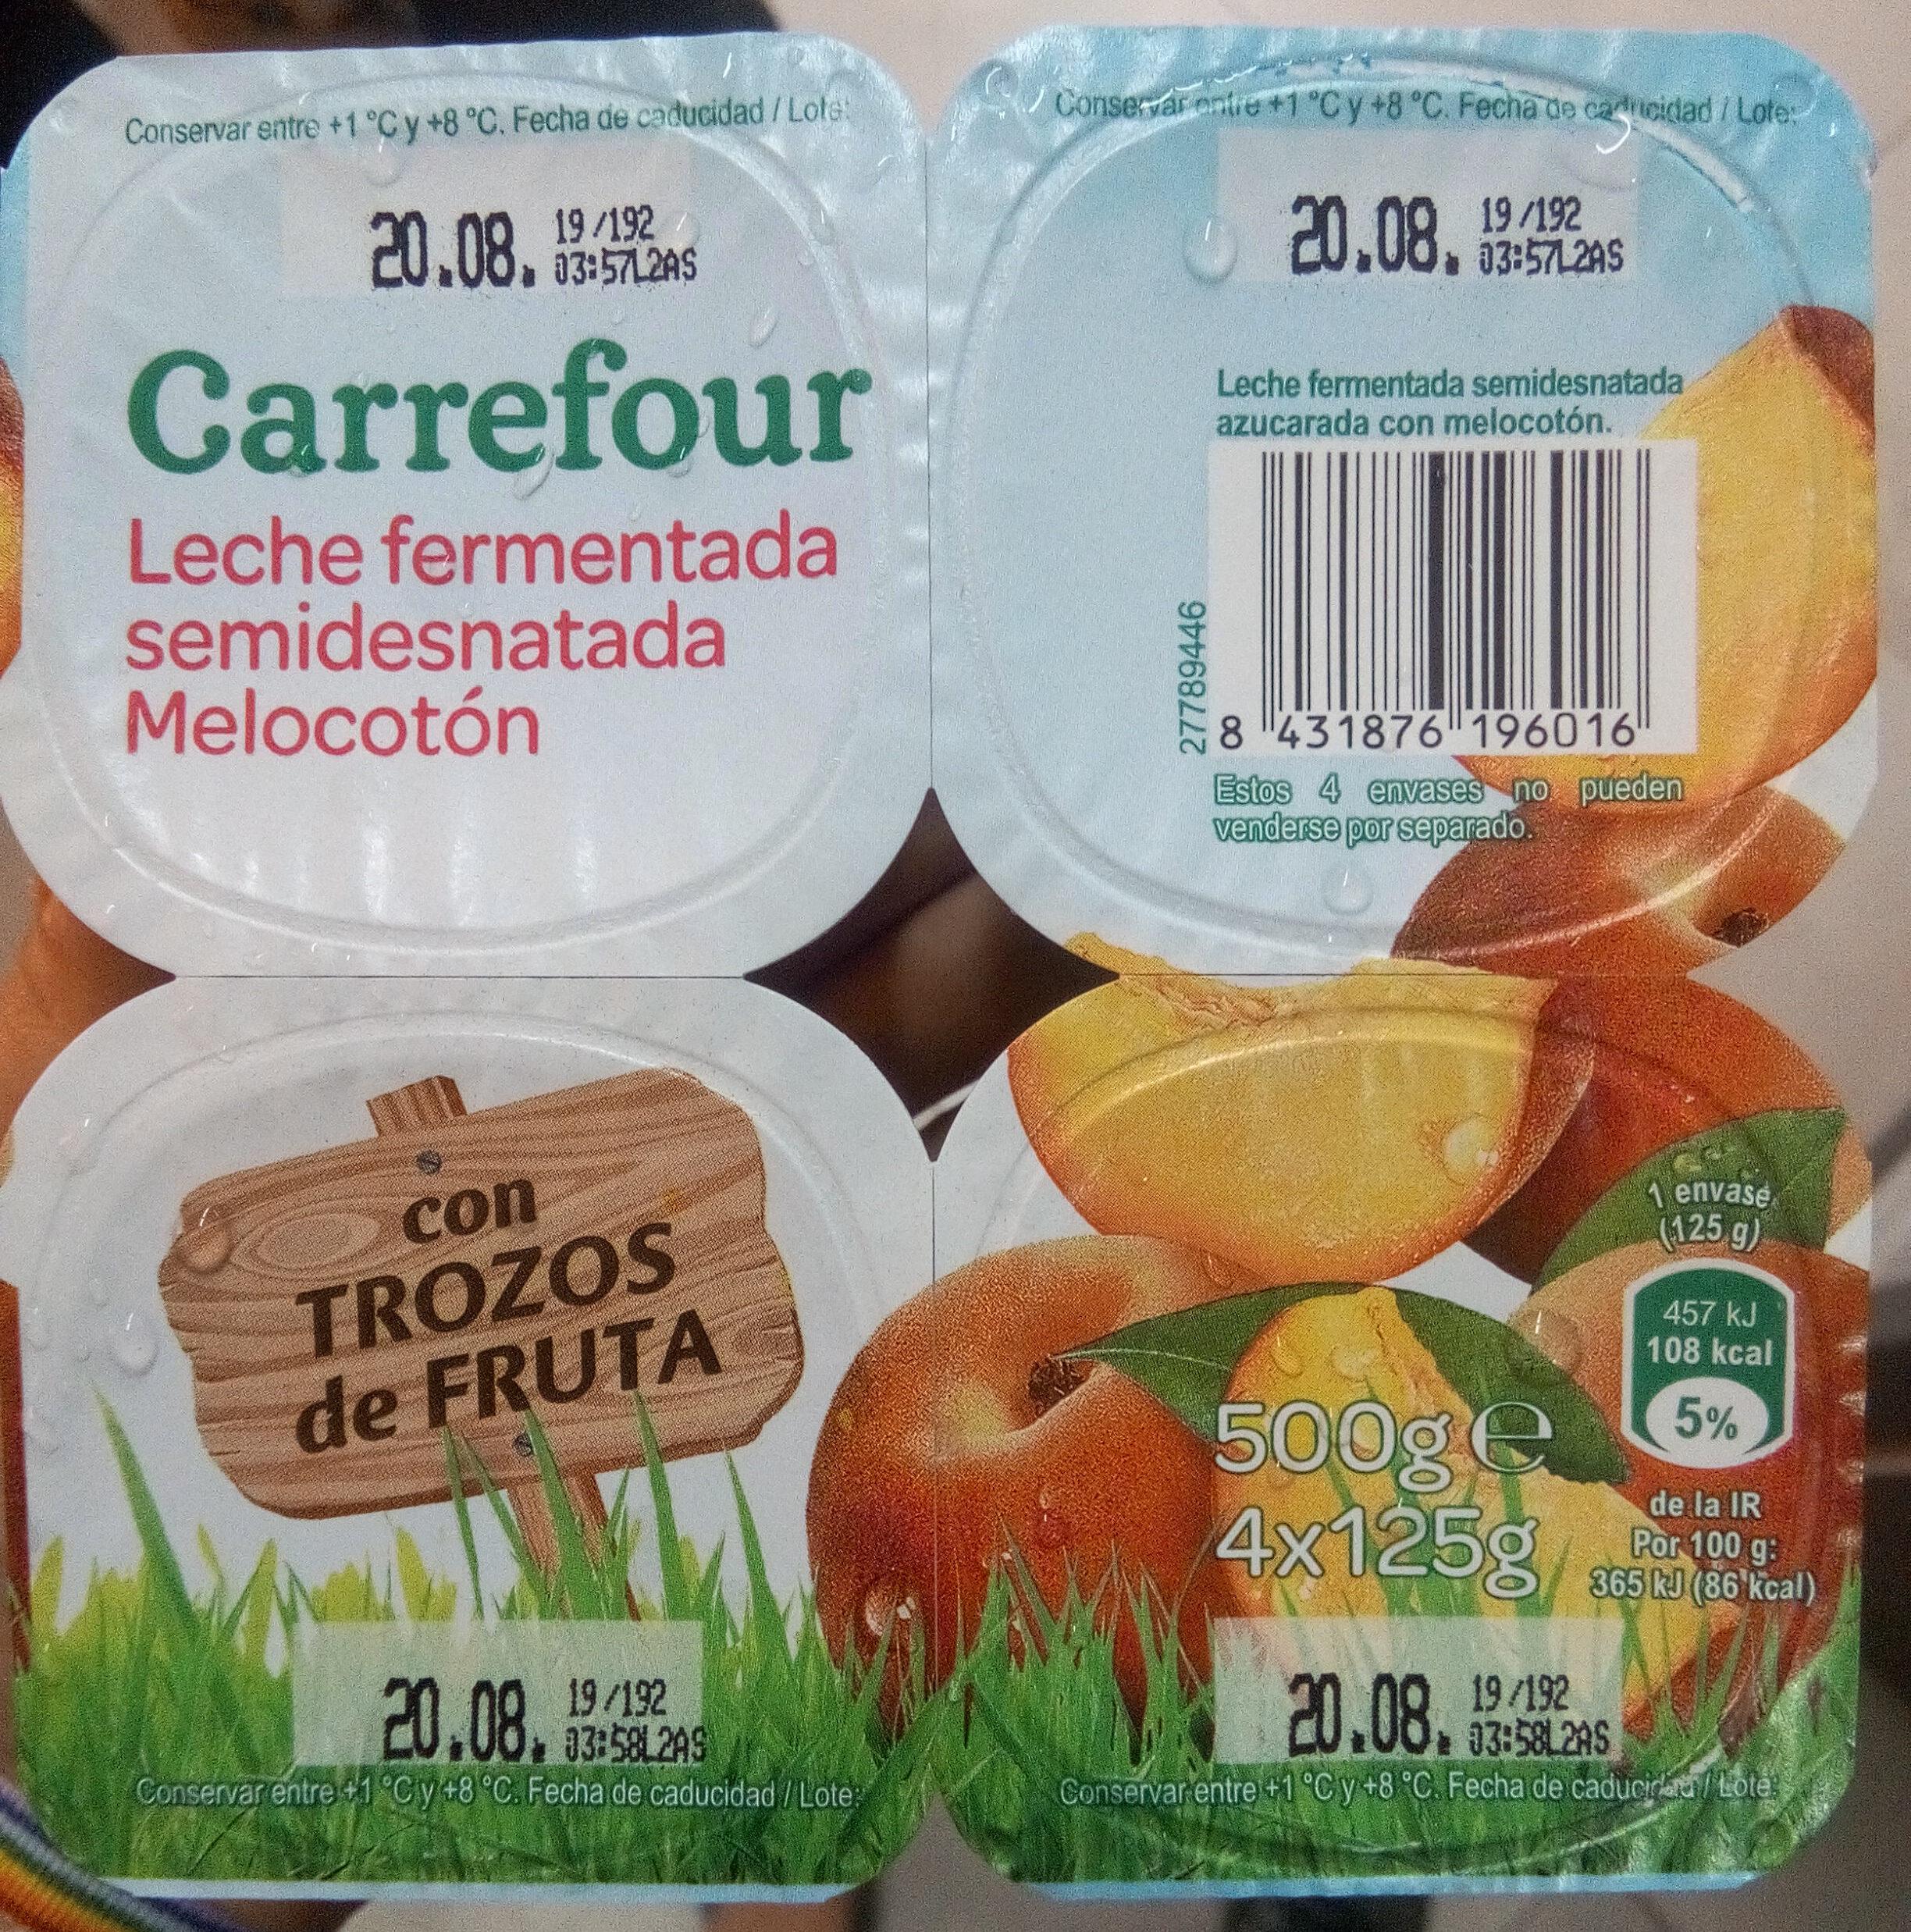 Leche fermentada semidesnatada Melocotón - Product